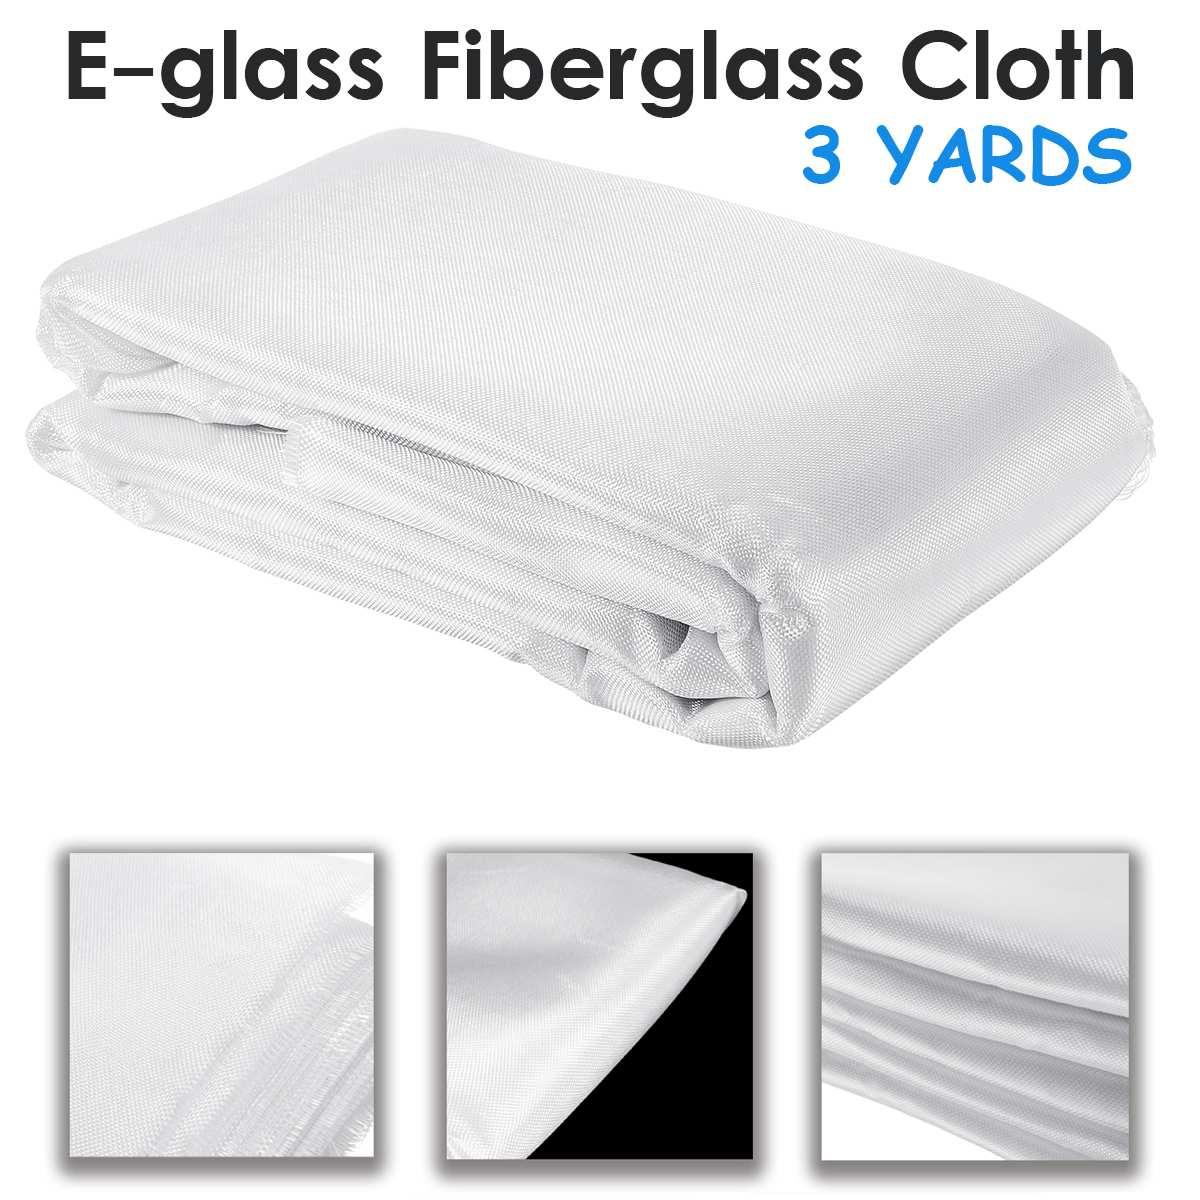 Manta ignífuga de fibra de vidrio ignífuga de emergencia protección contra incendios cubierta de seguridad manta de emergencia tela de fibra de vidrio